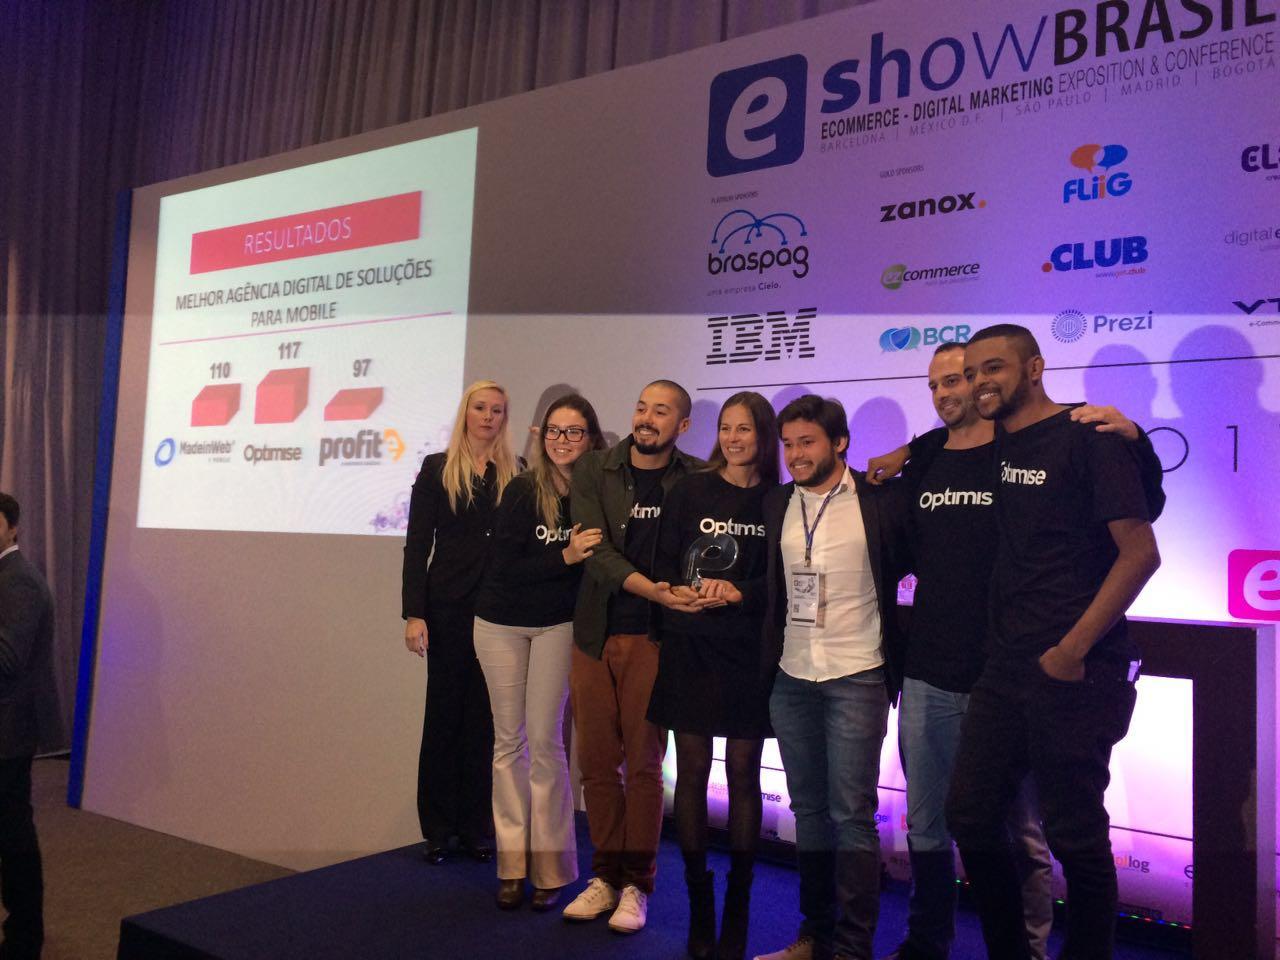 Best Digital Agency Mobile – Optimise wins eAwards Brasil